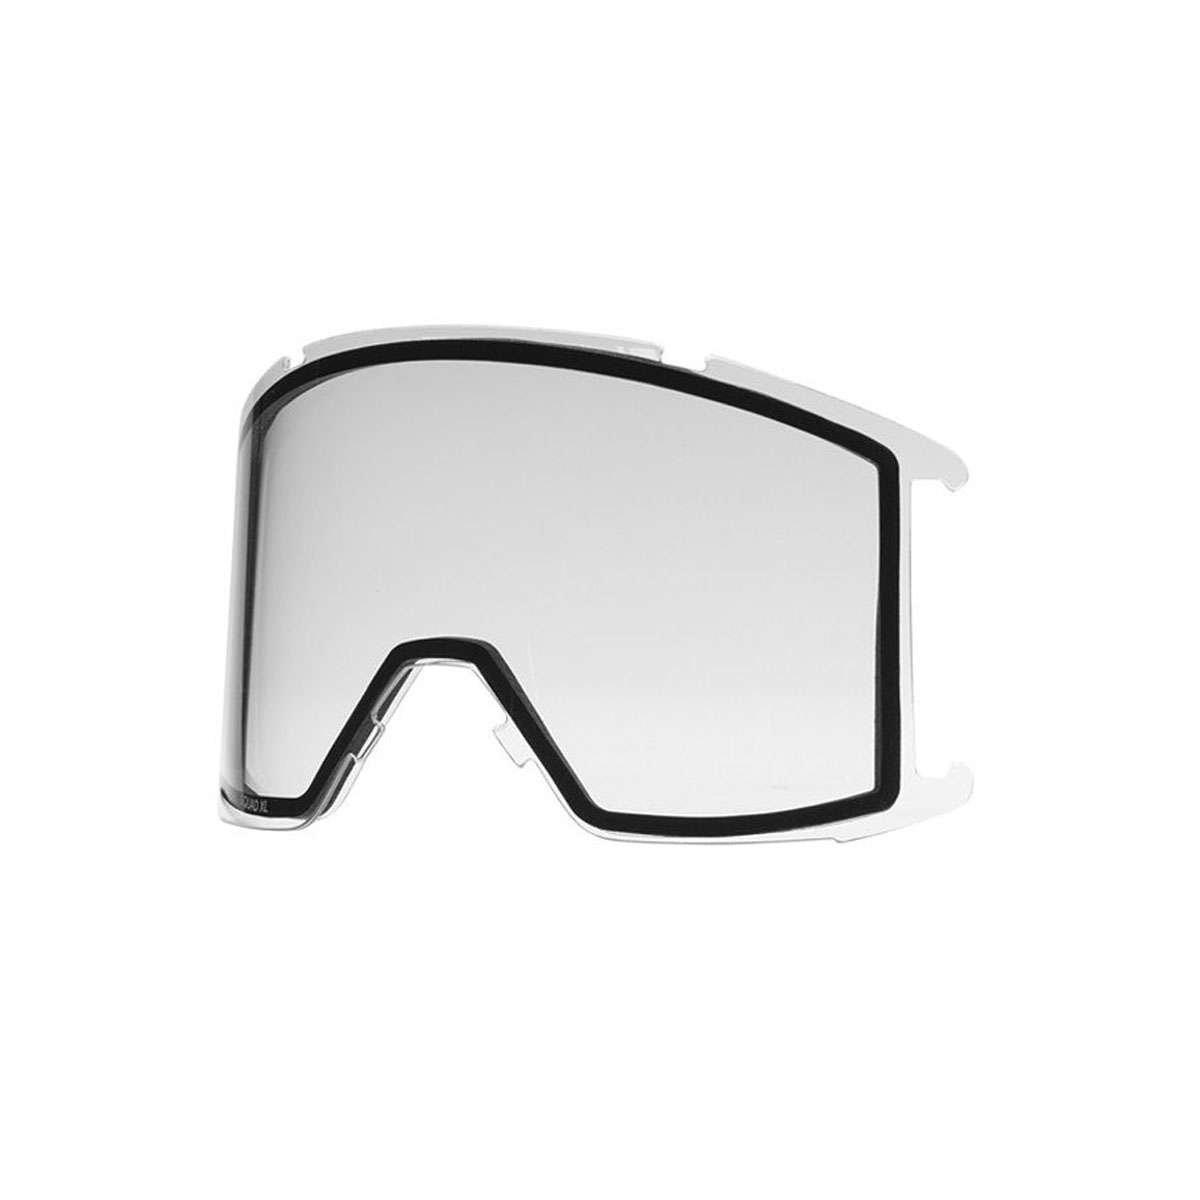 e45fadf036f Smith Squad XL Clear Lens Smith Optics  1541005623-270311  -  13.40